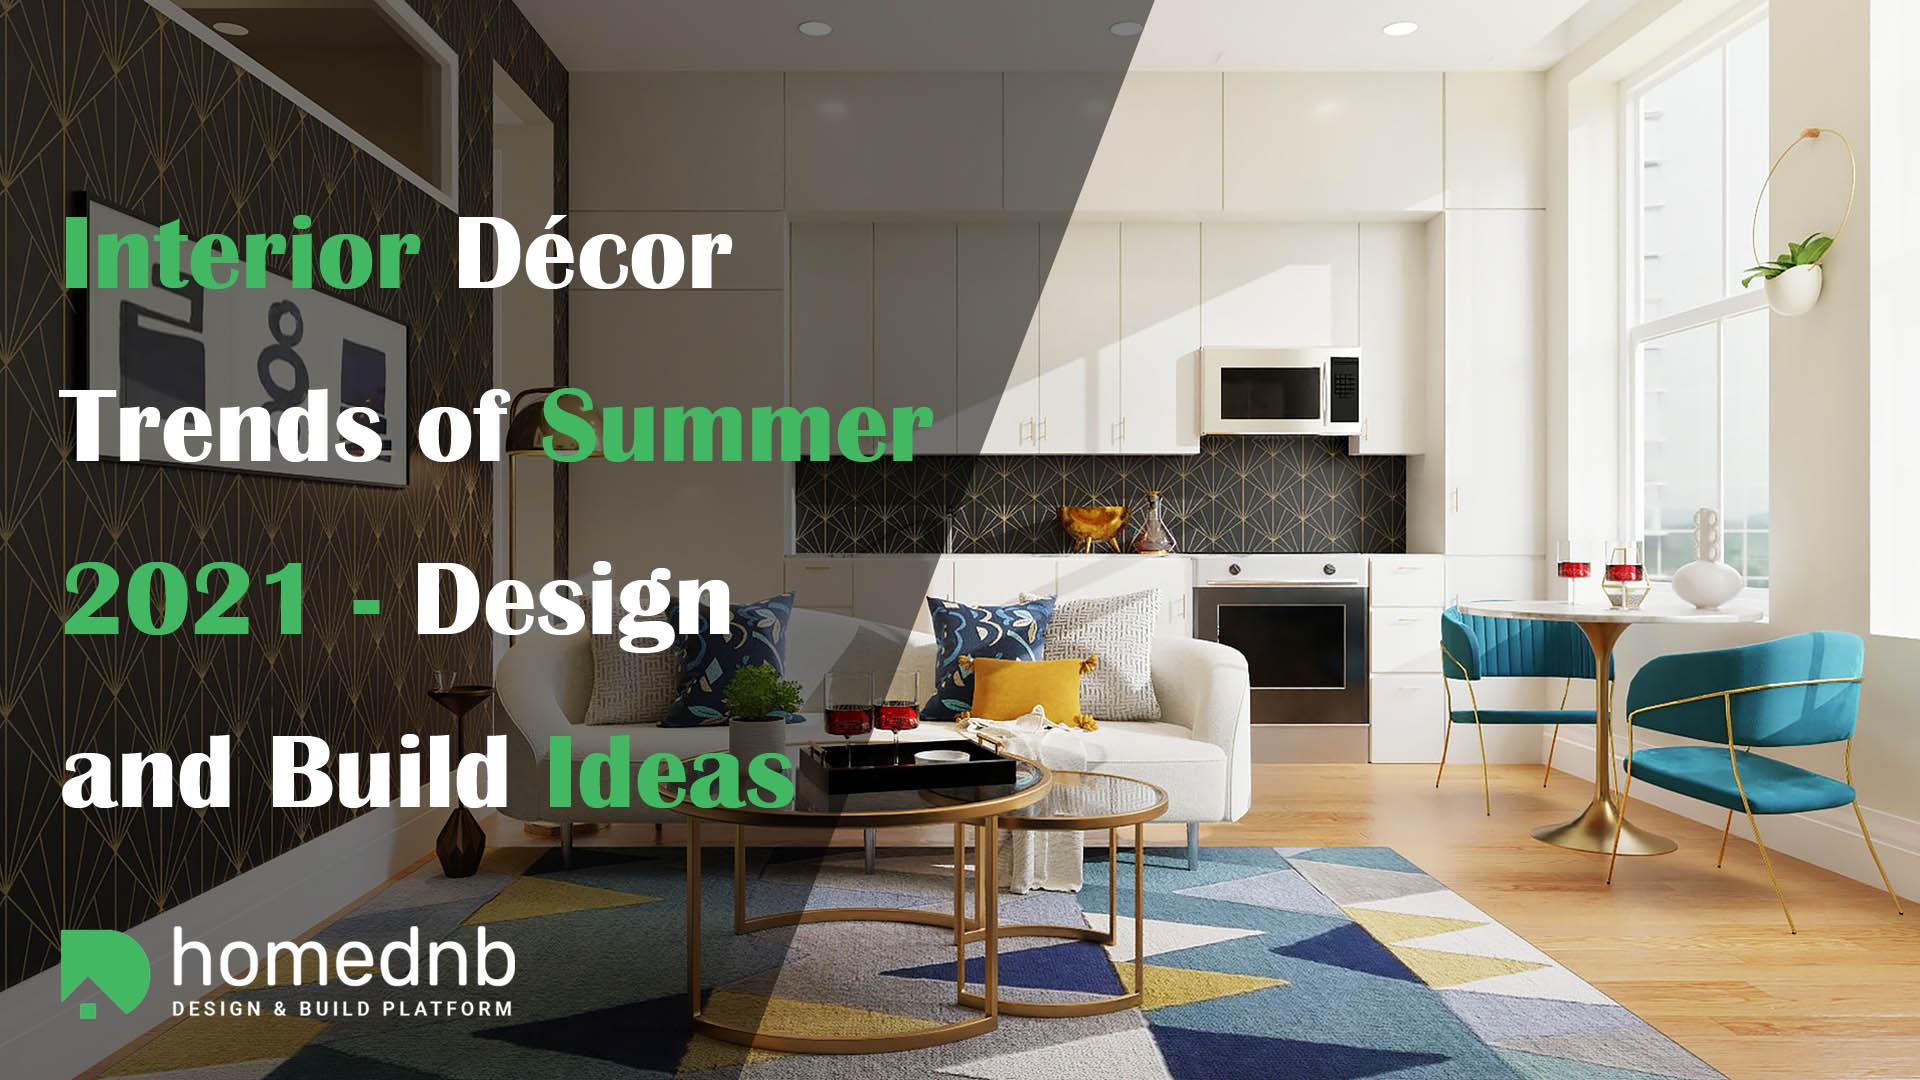 Interior Décor Trends of Summer 2021 - Design and Build Ideas